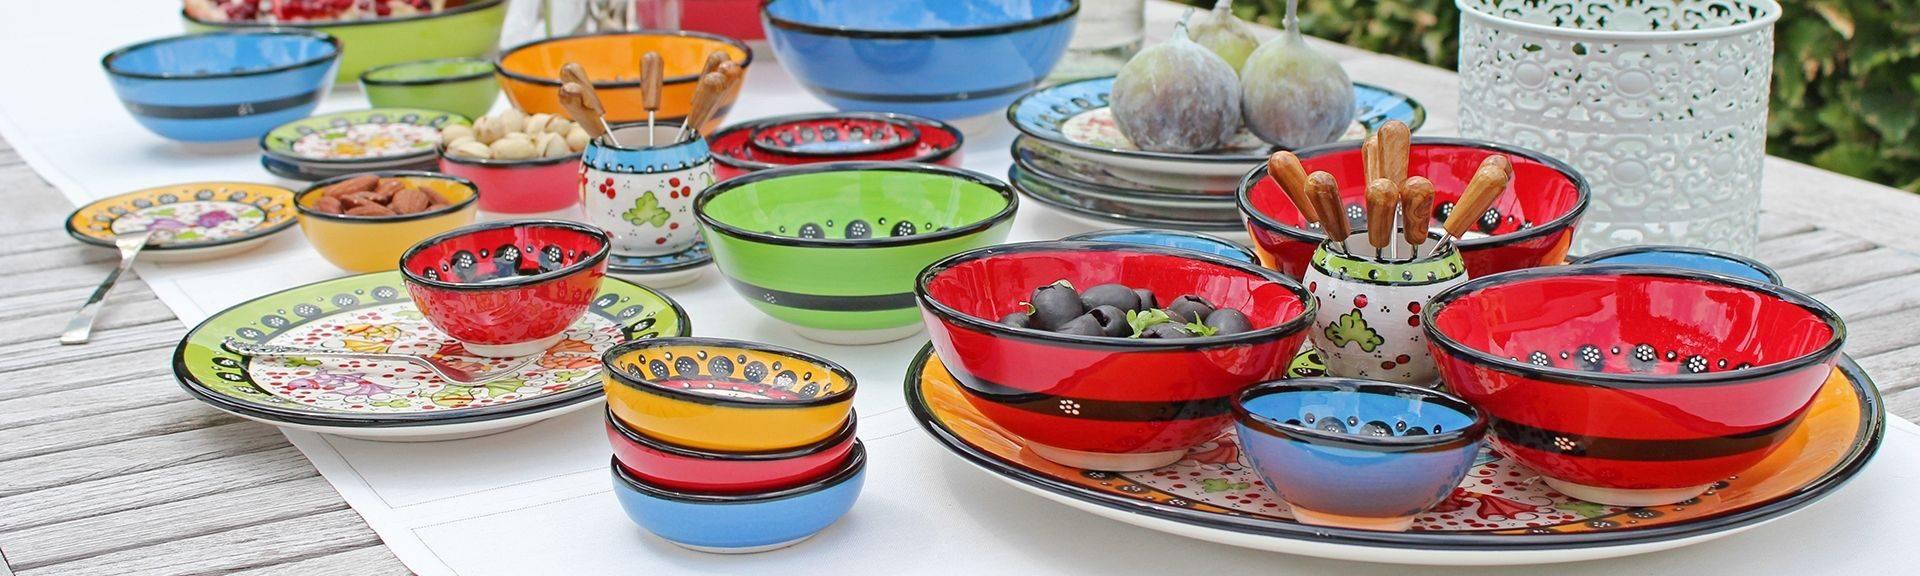 Keramik Serie Nimet